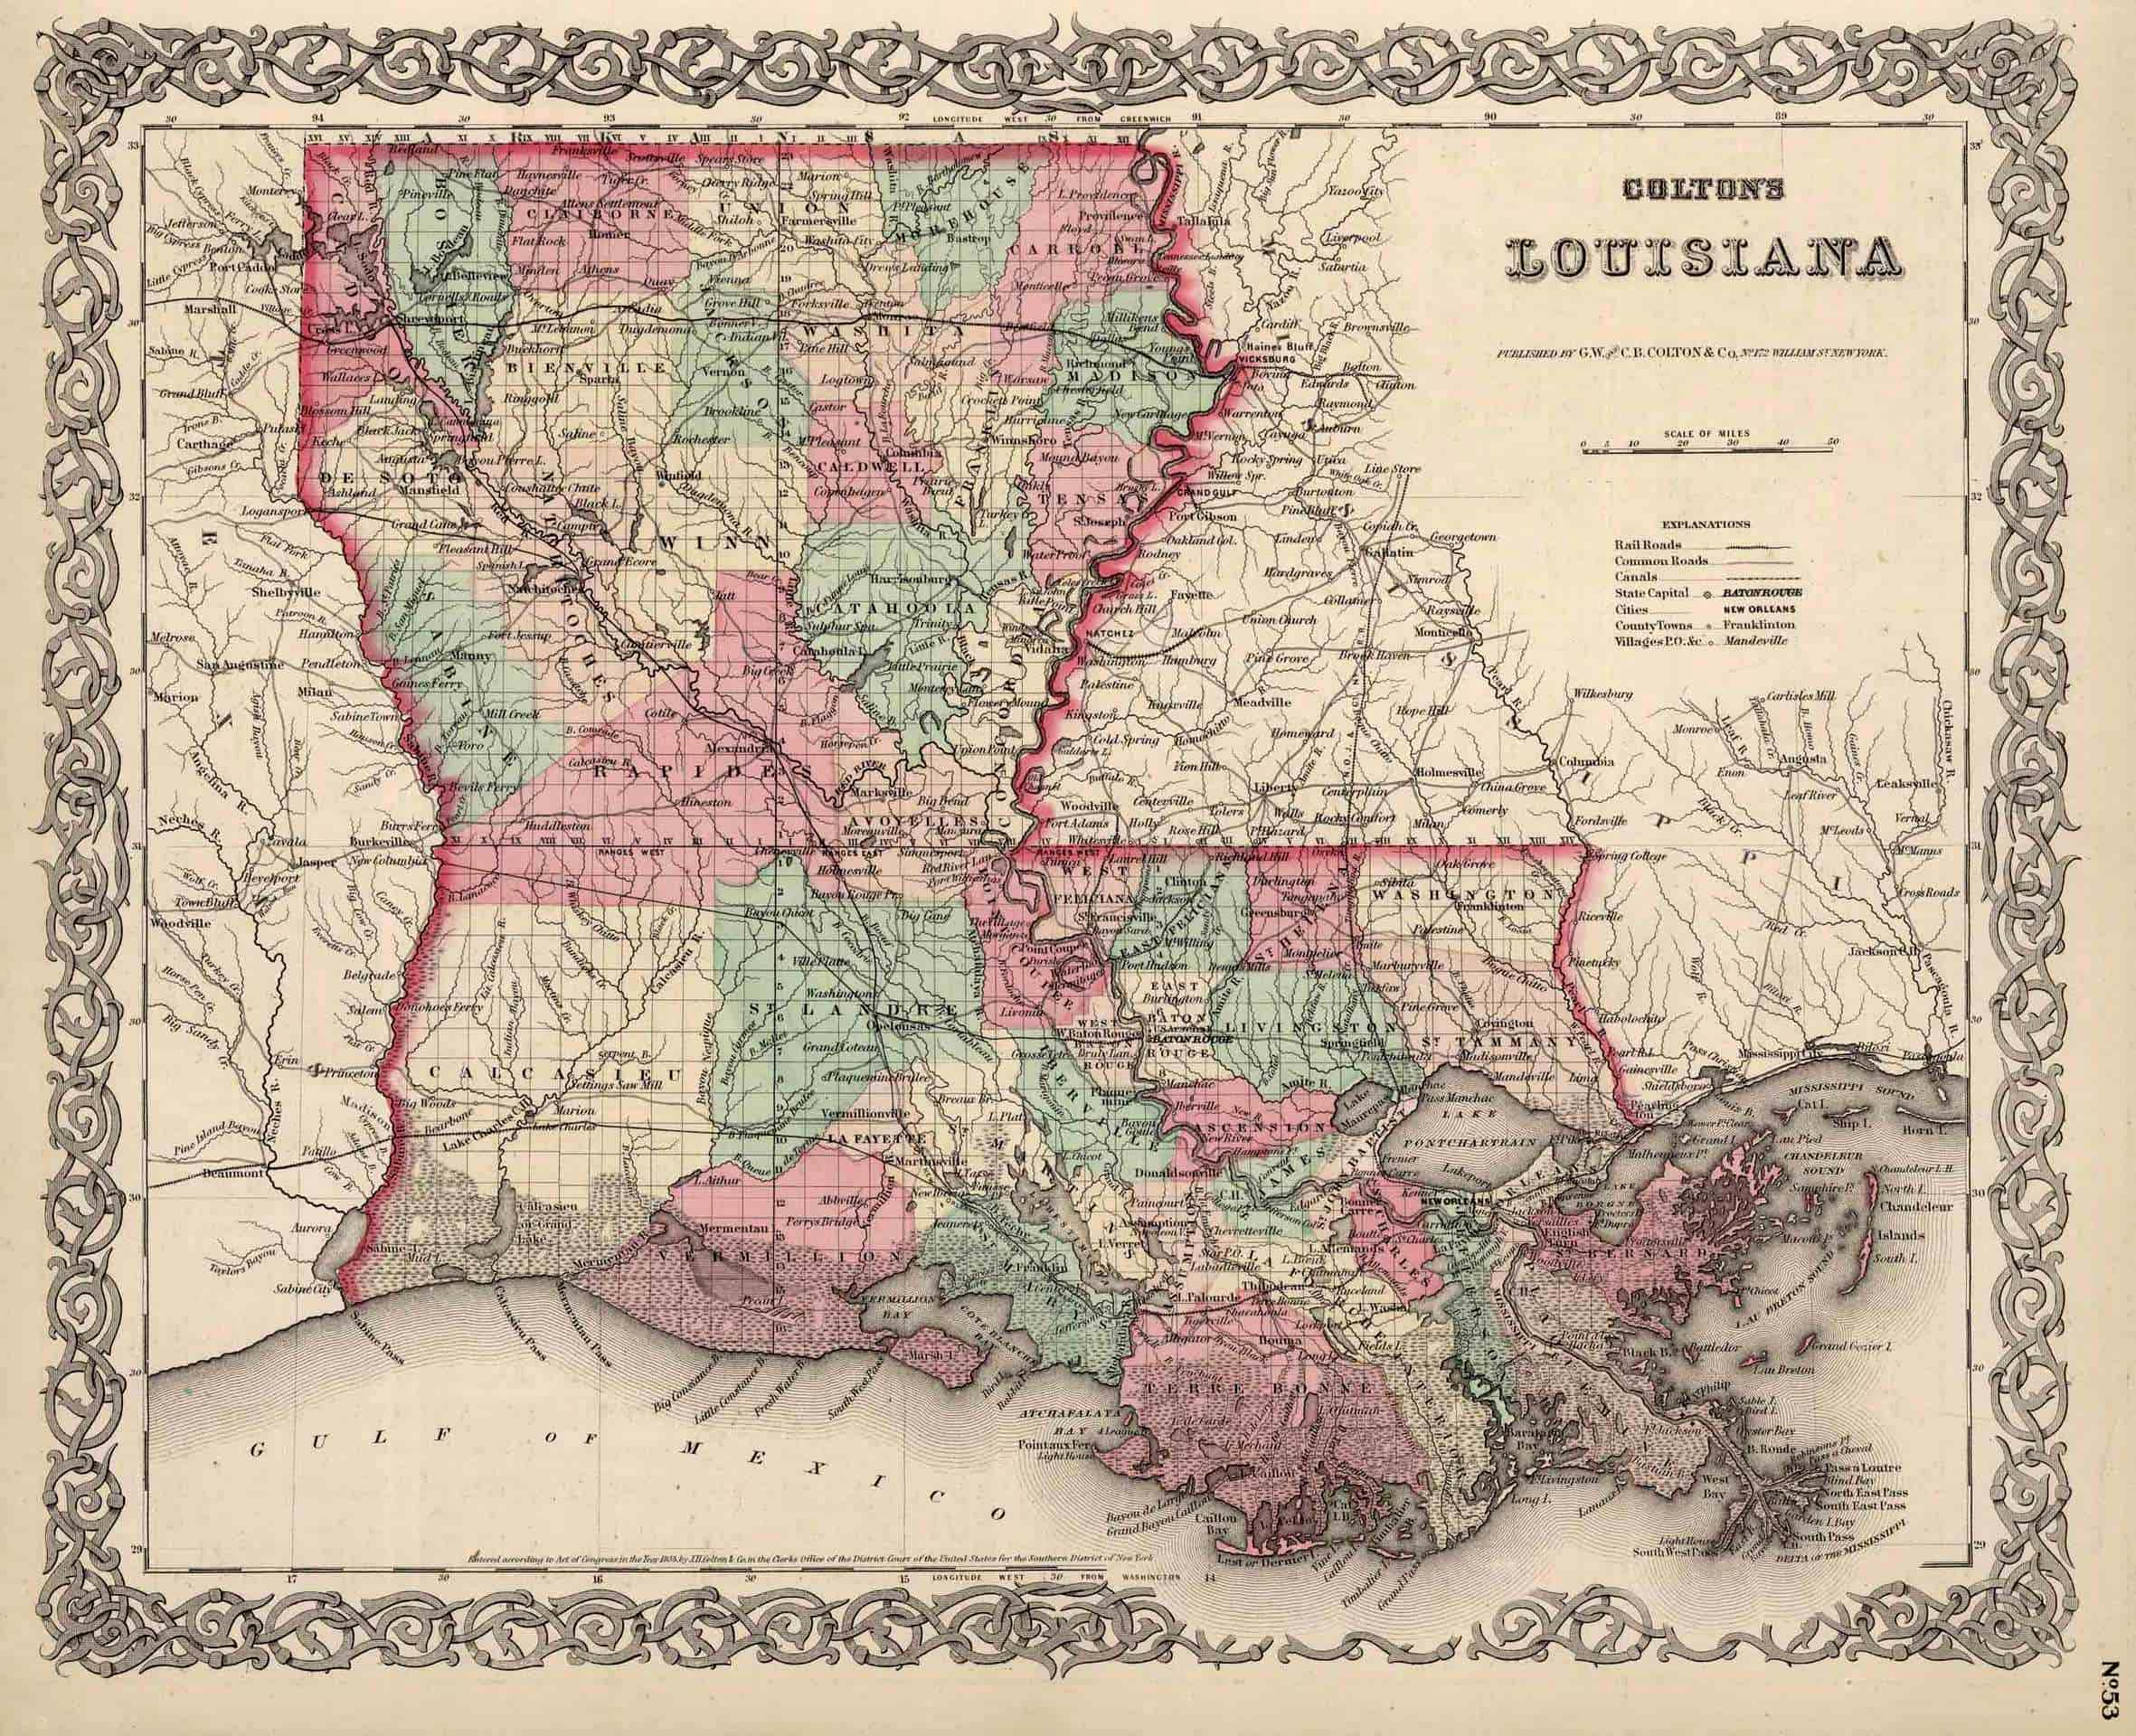 Opelousas Louisiana Map.Opelousas Massacre 1868 Blackpast